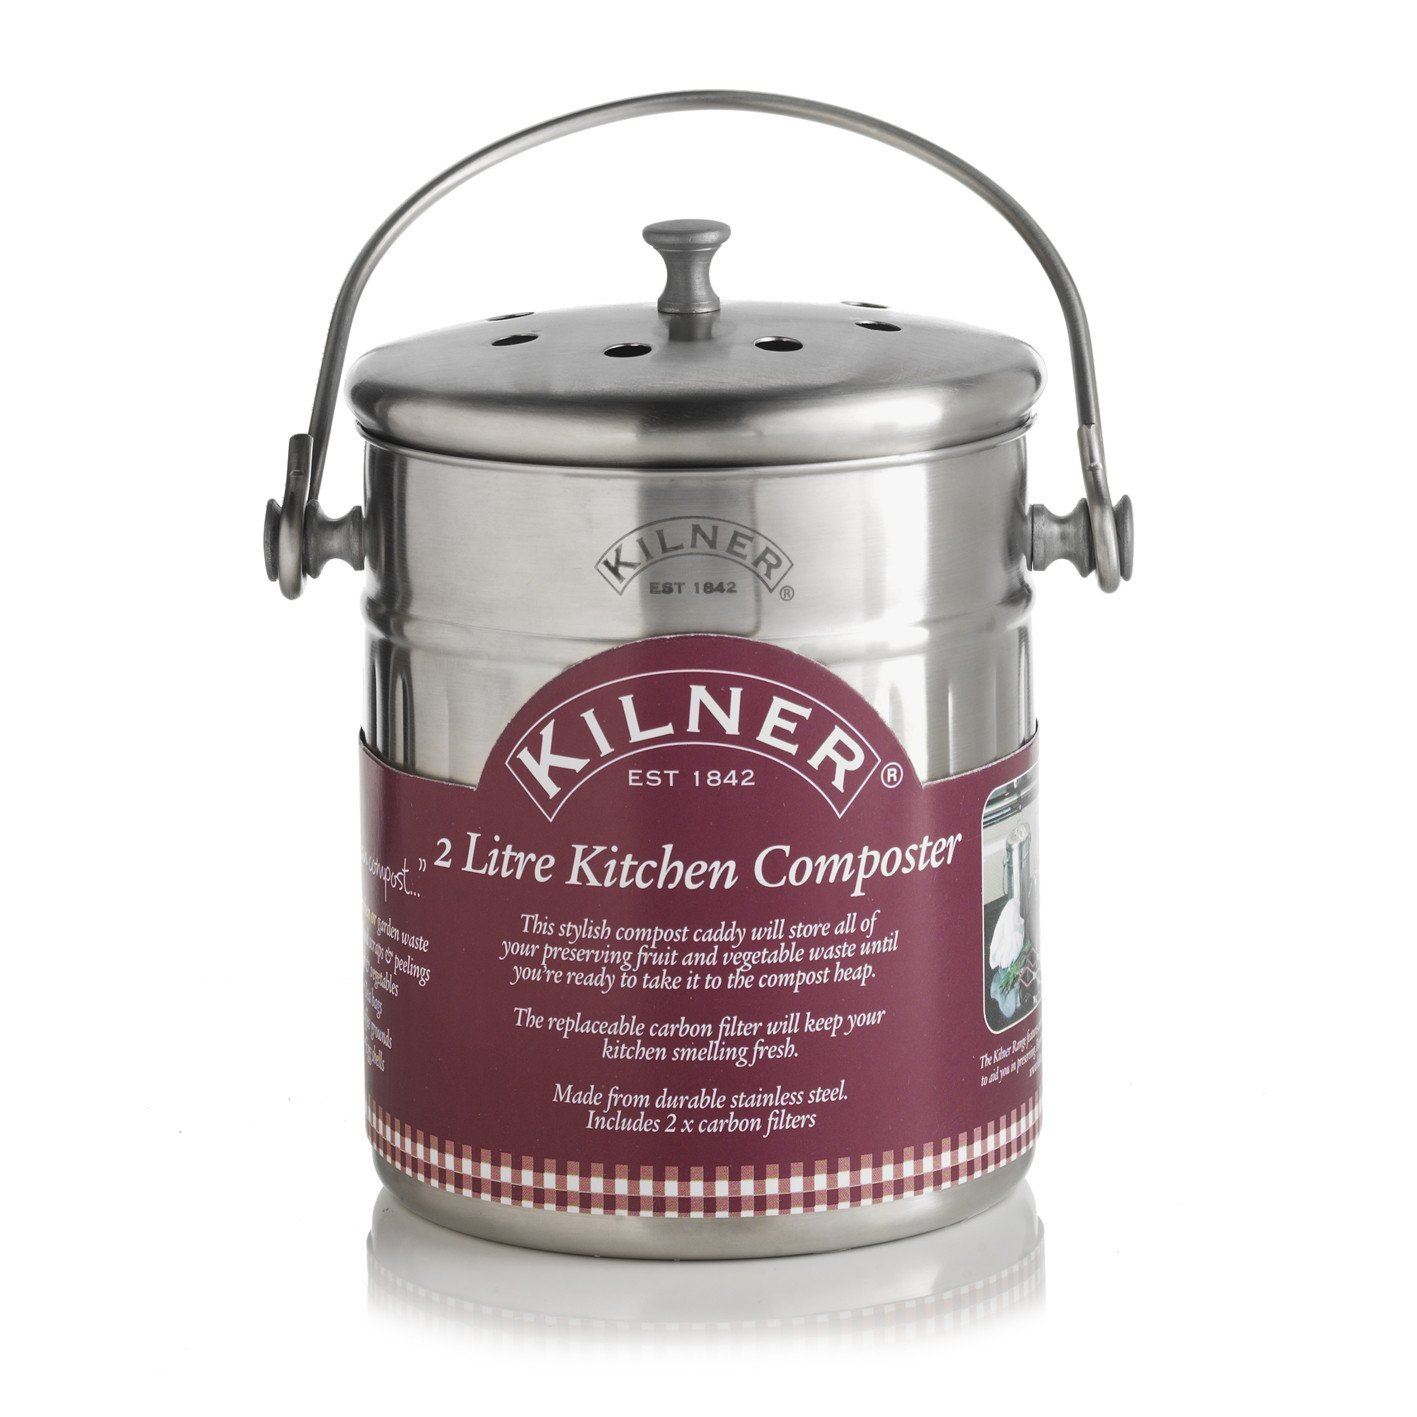 Amazon.com : 2l Kilner Kitchen Compost Bin : Garden & Outdoor